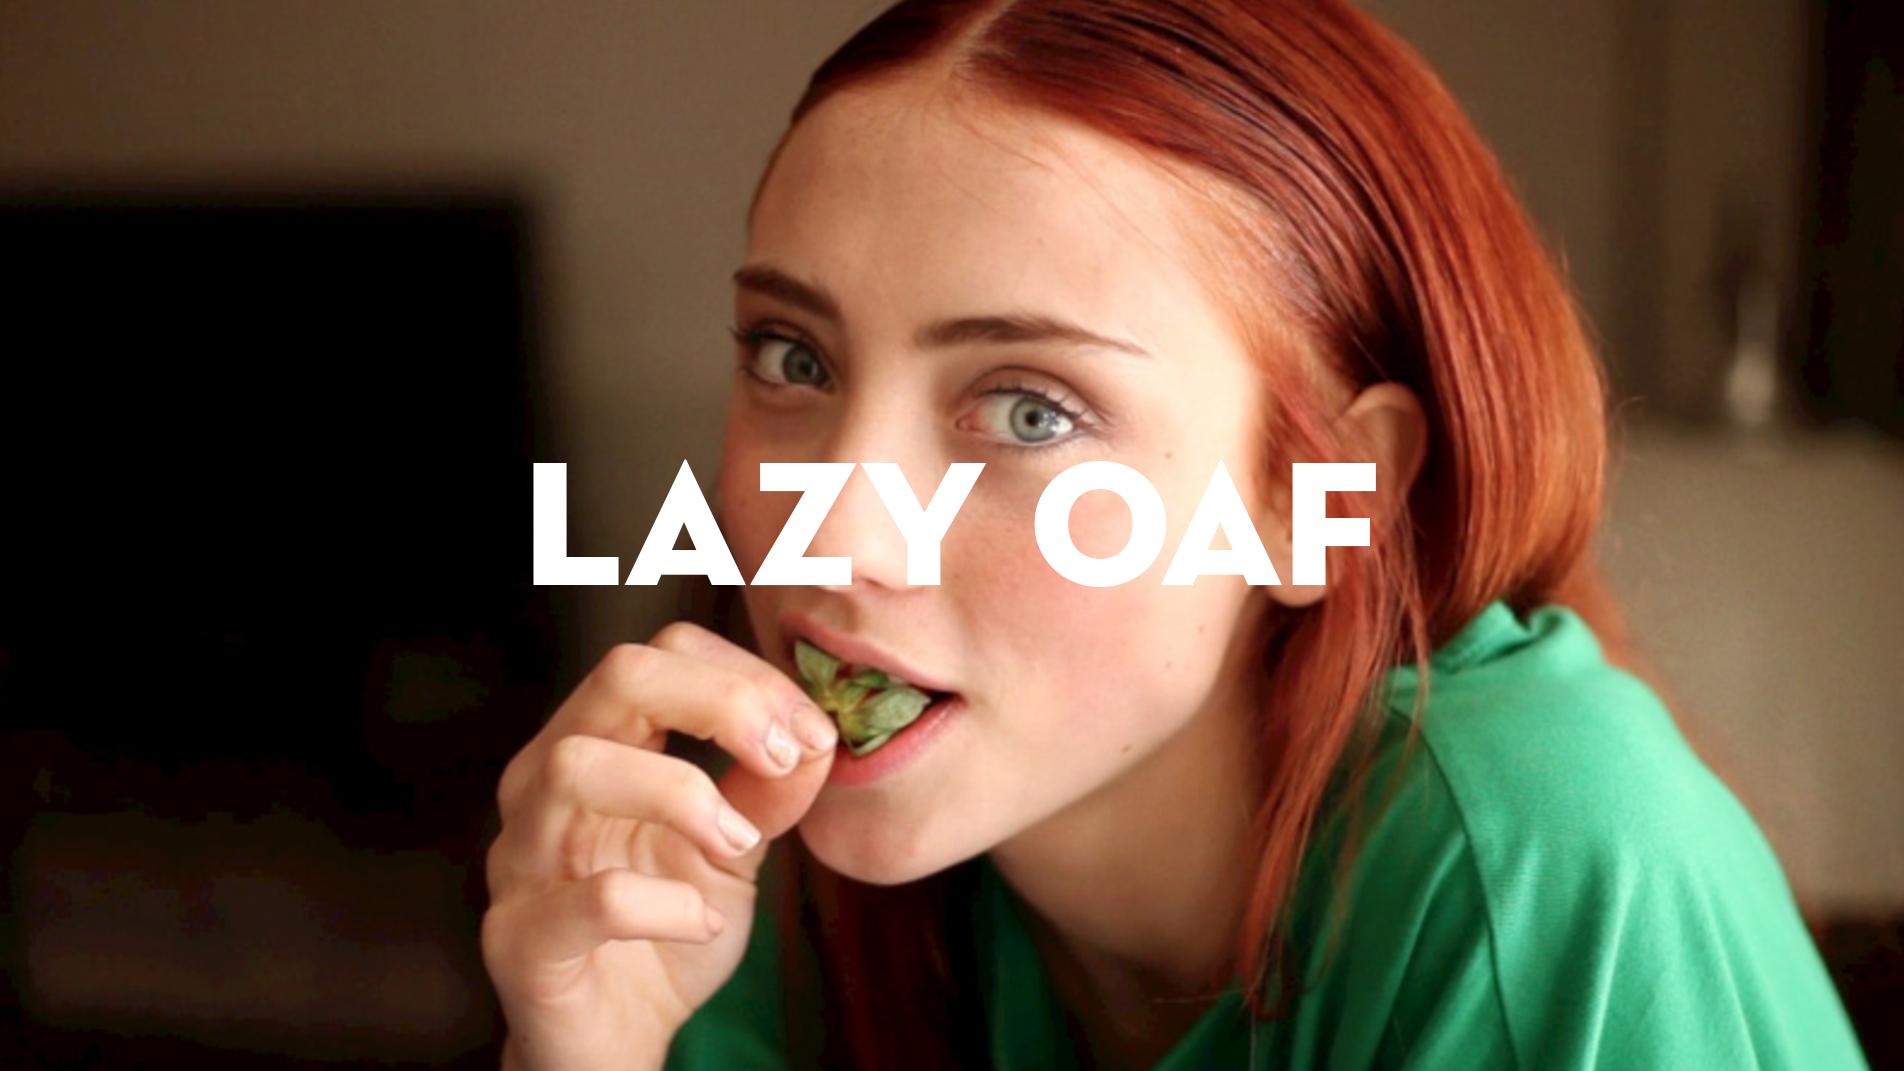 LAZY OAF // AIN'T SHE SWEET